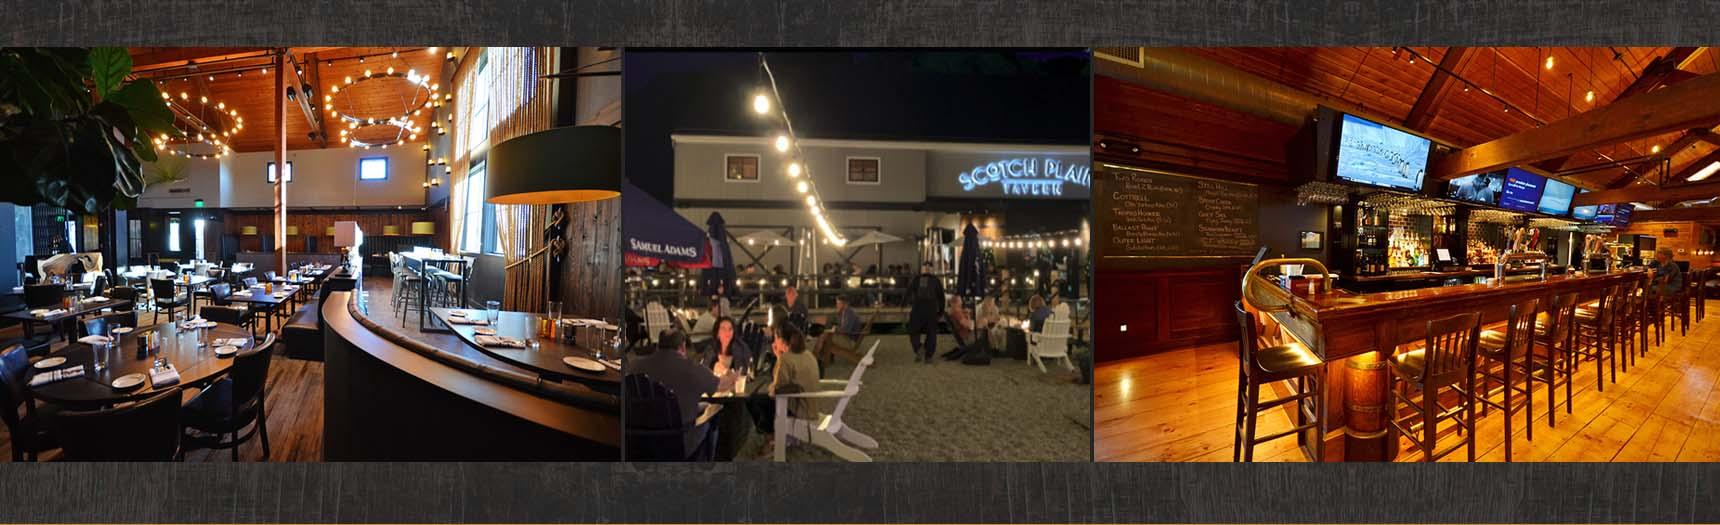 Scotch Plains Tavern home page